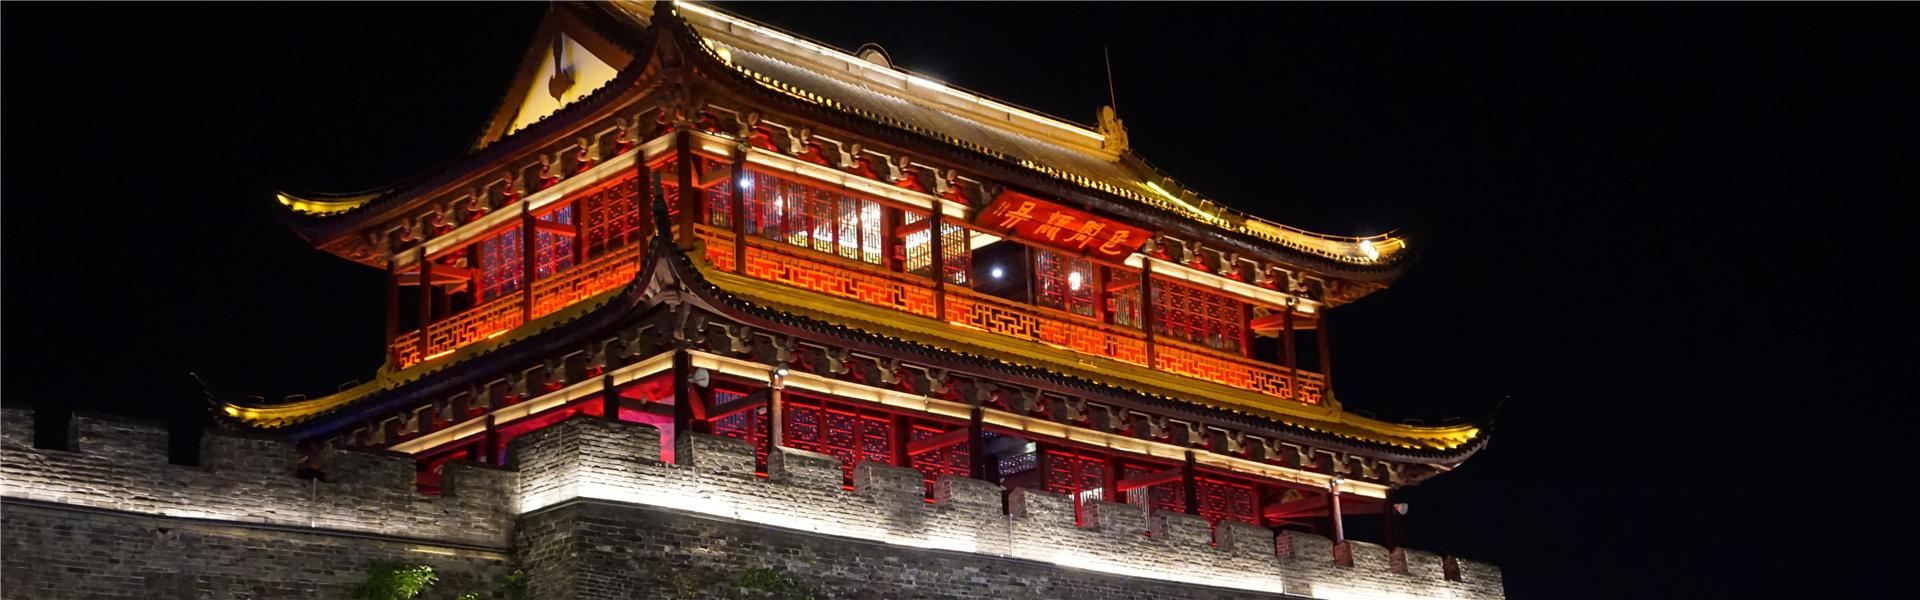 Quzhou's nighttime economy back in full force